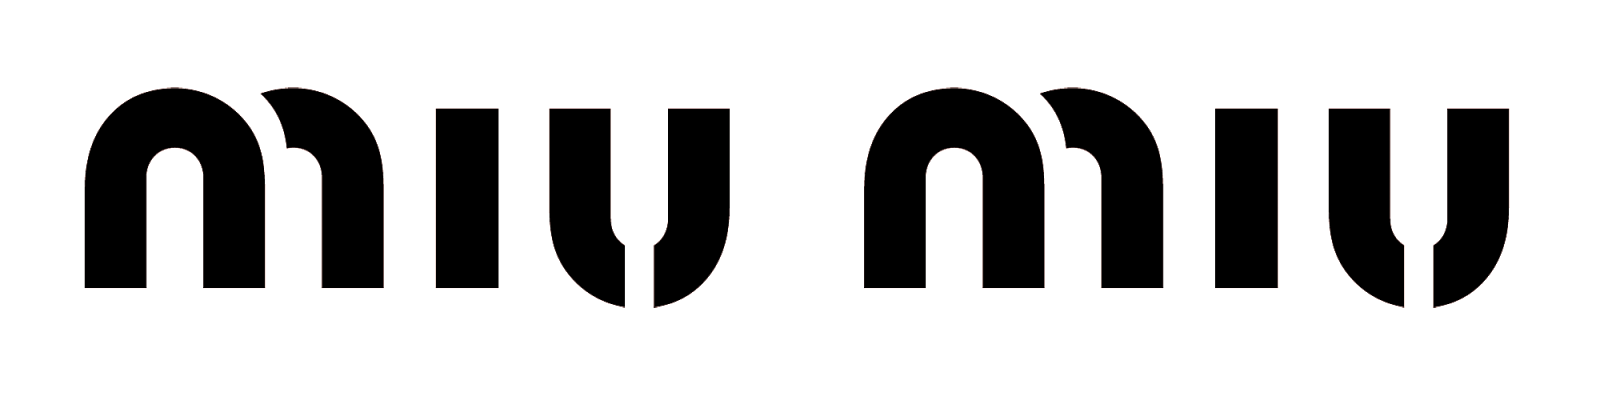 Okuliare Miu Miu logo